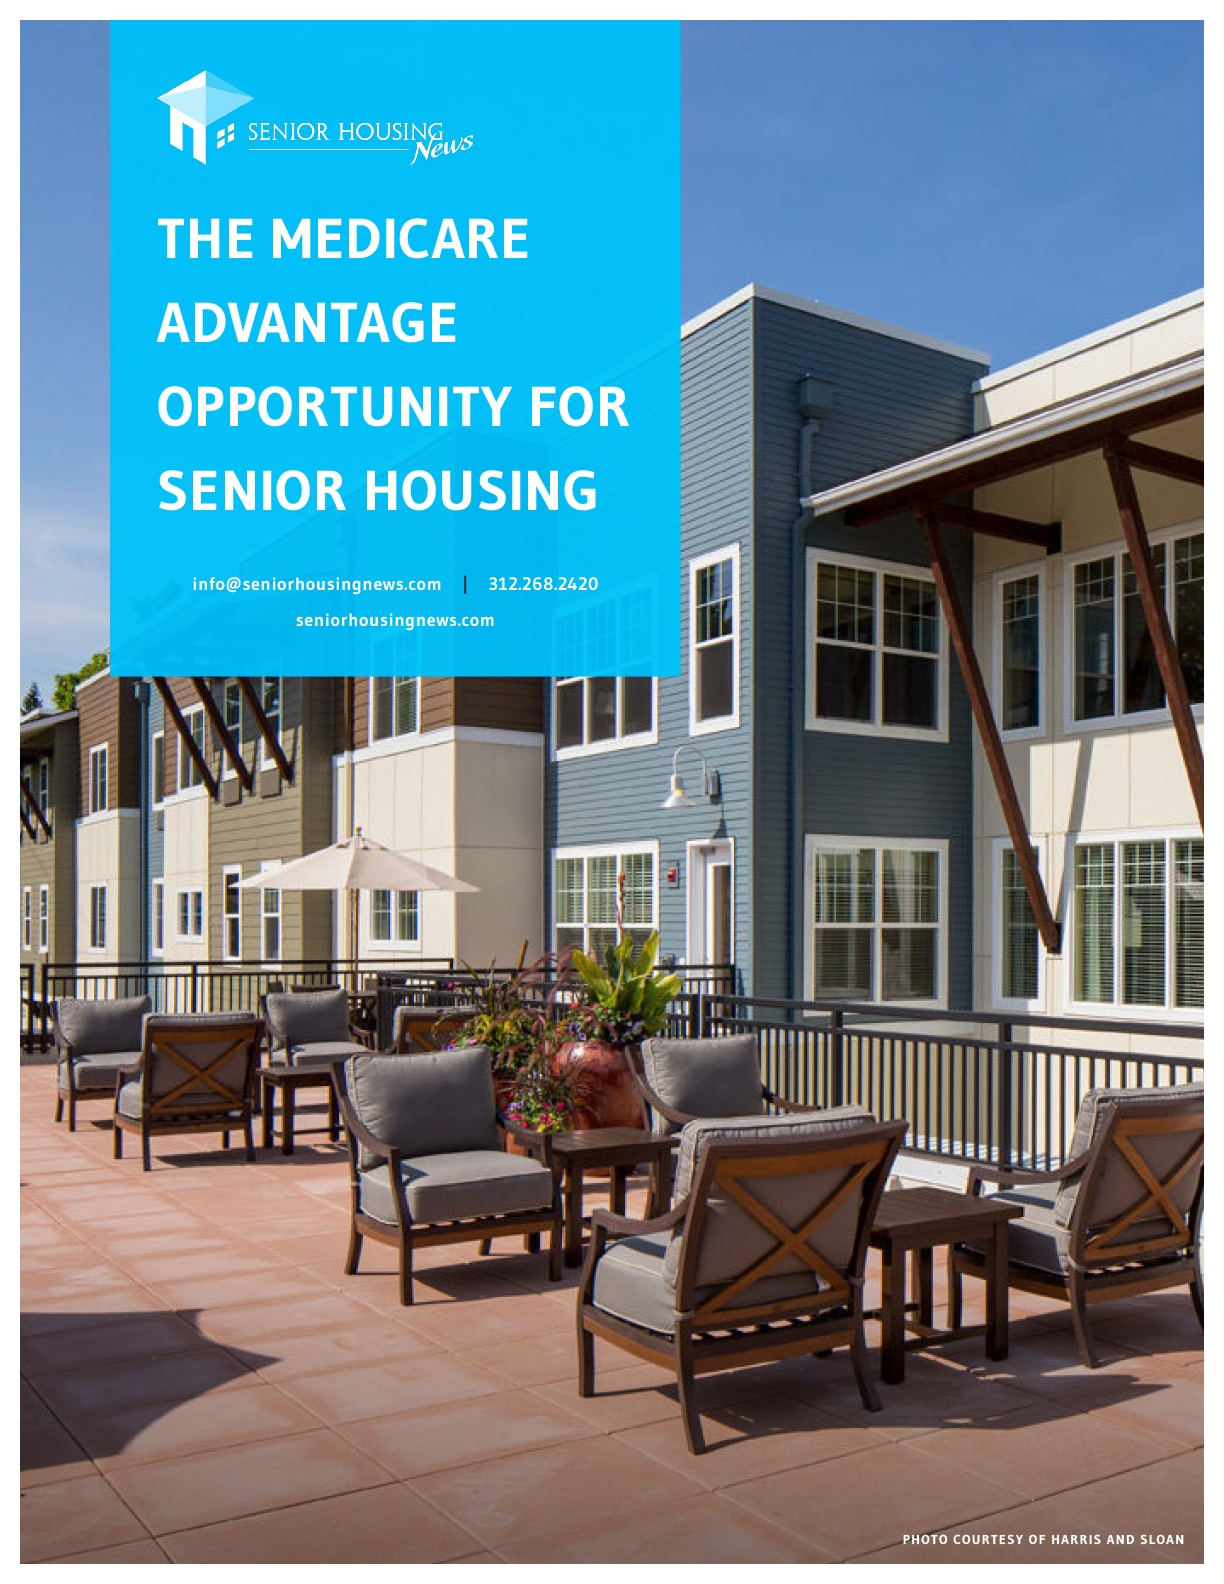 Medicare-Advantage-Image